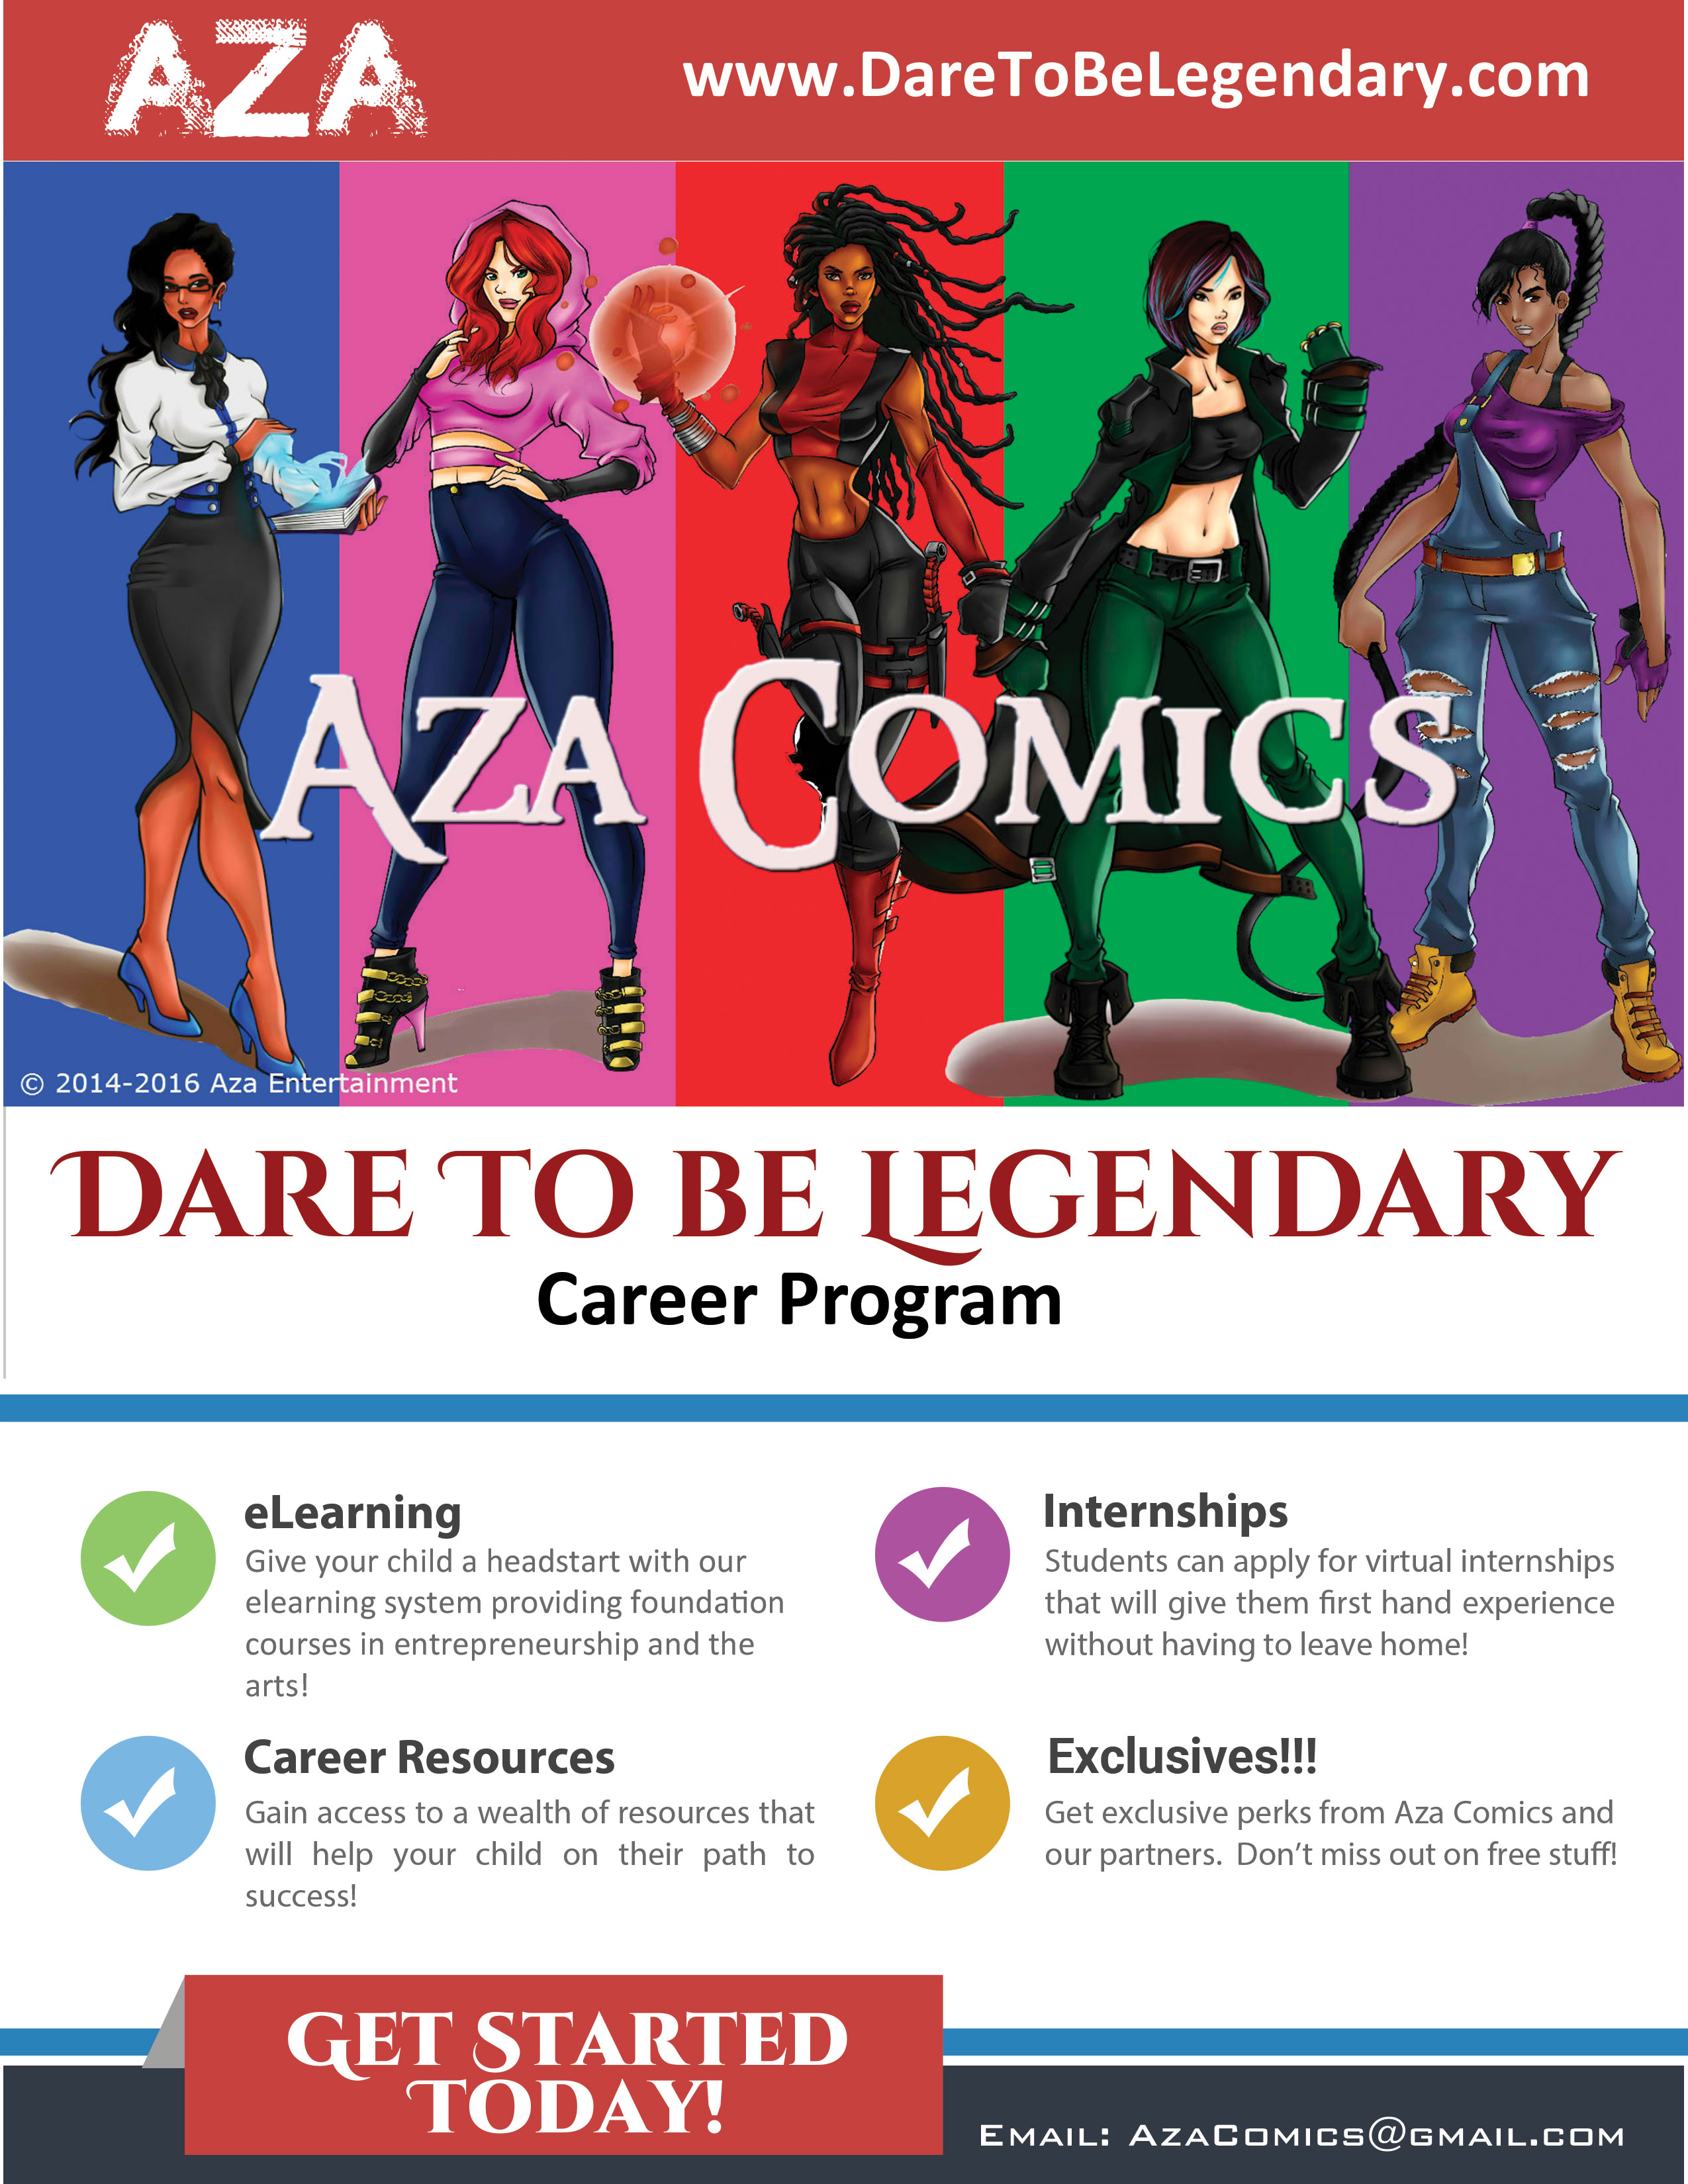 aza comics dare to be legendary career program